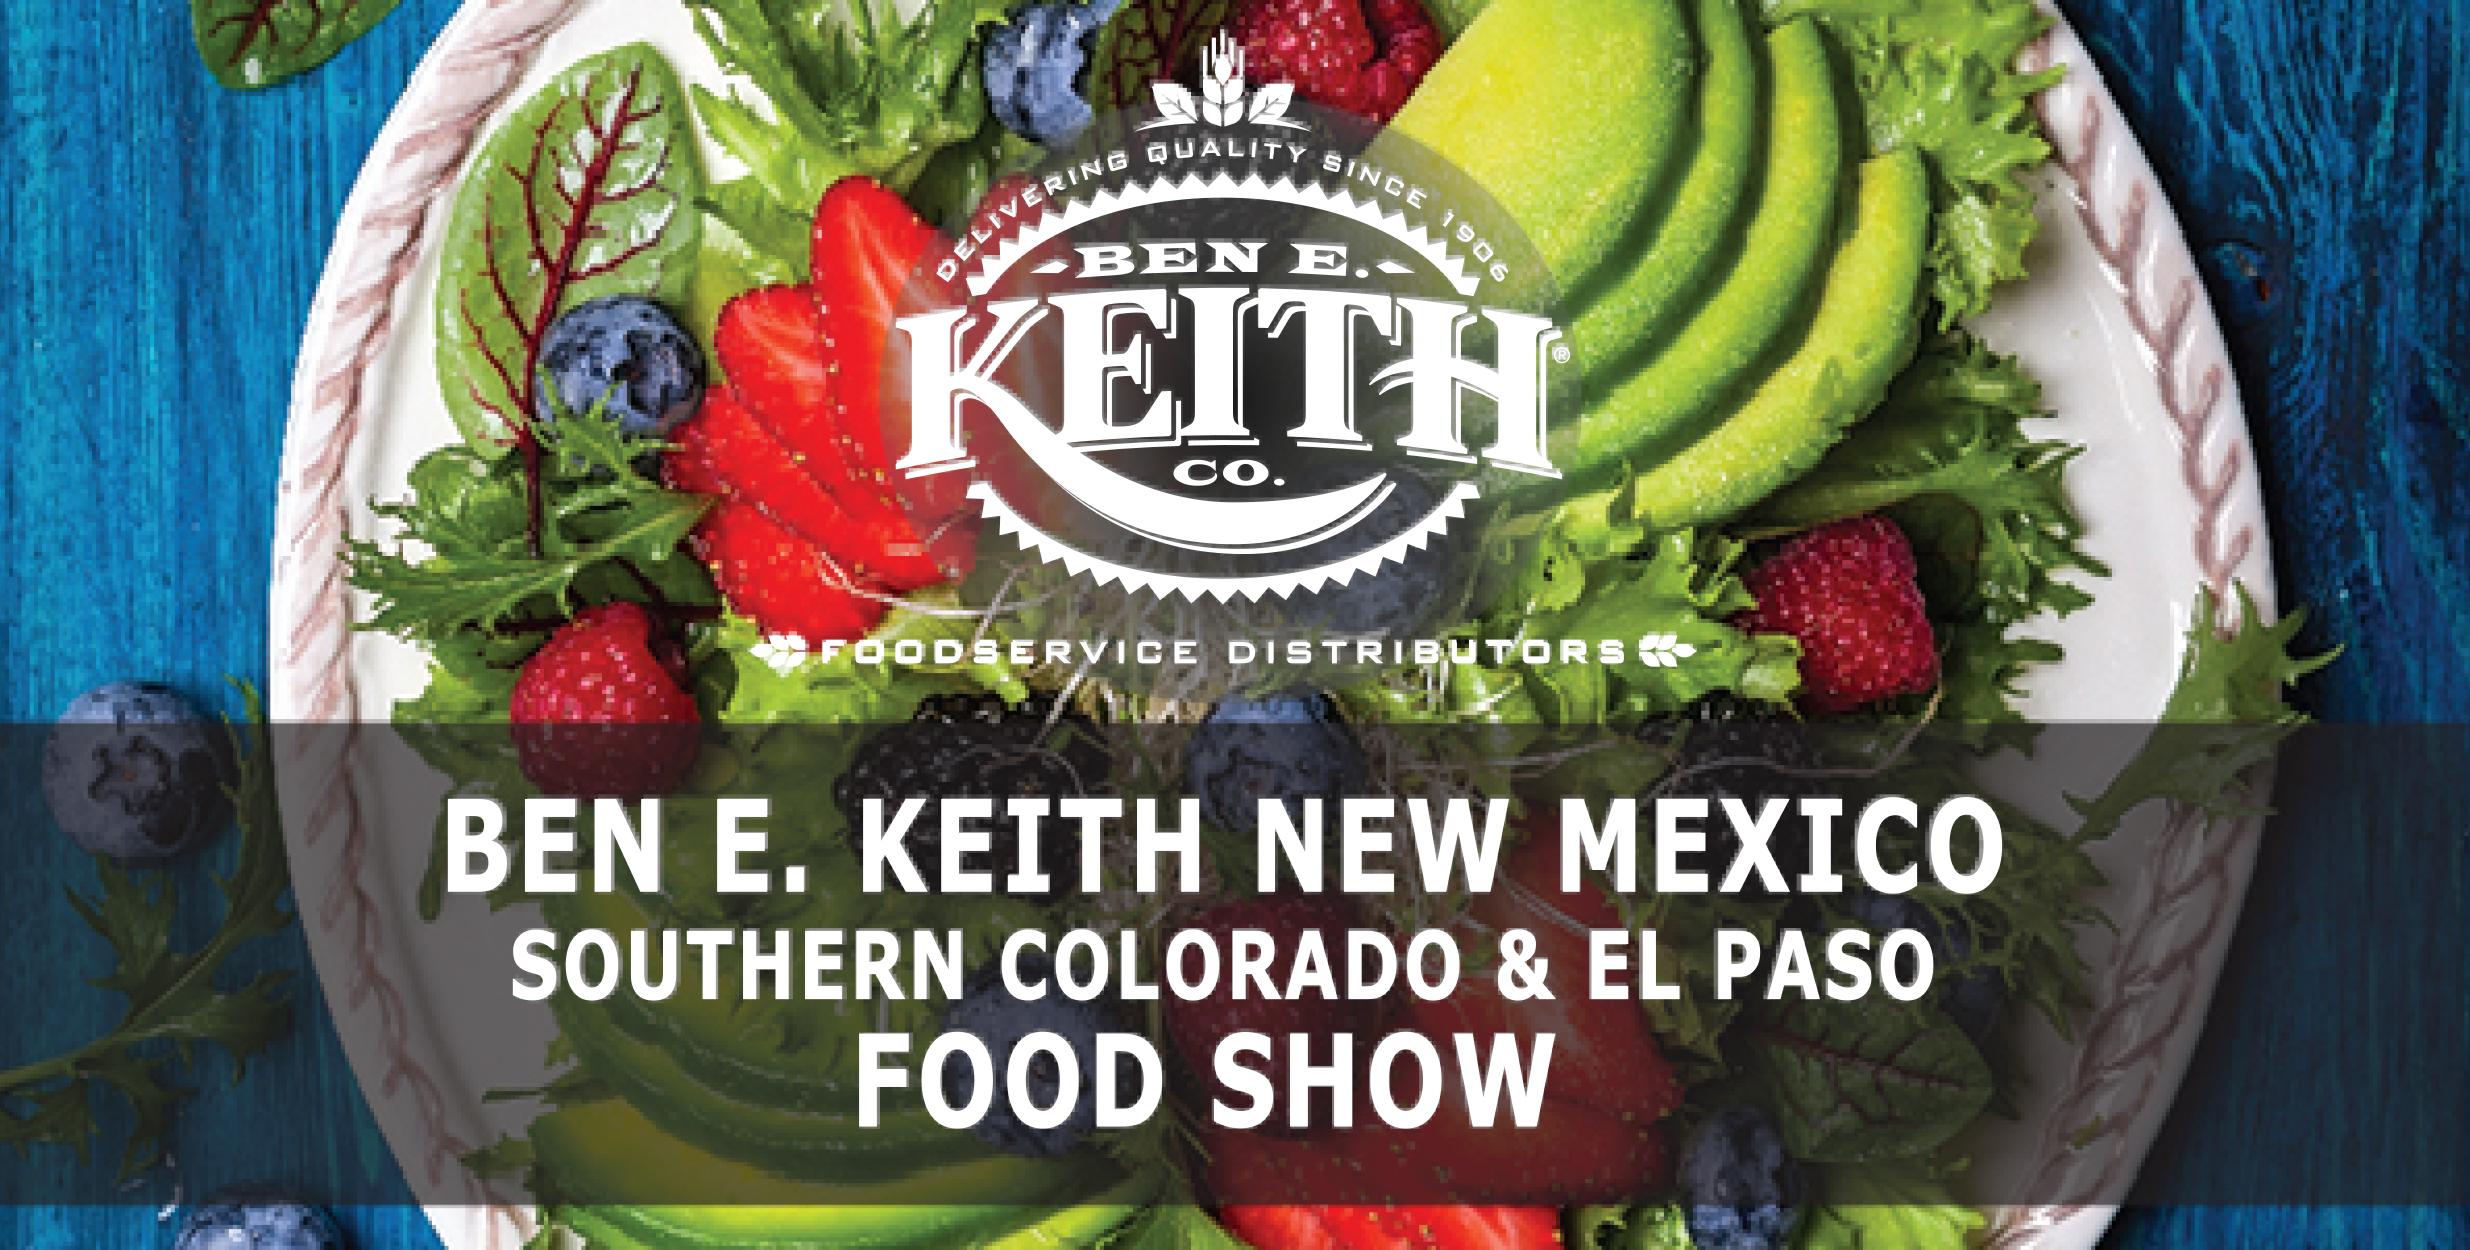 Ben E. Keith New Mexico, El Paso & Southern Colorado Food Show